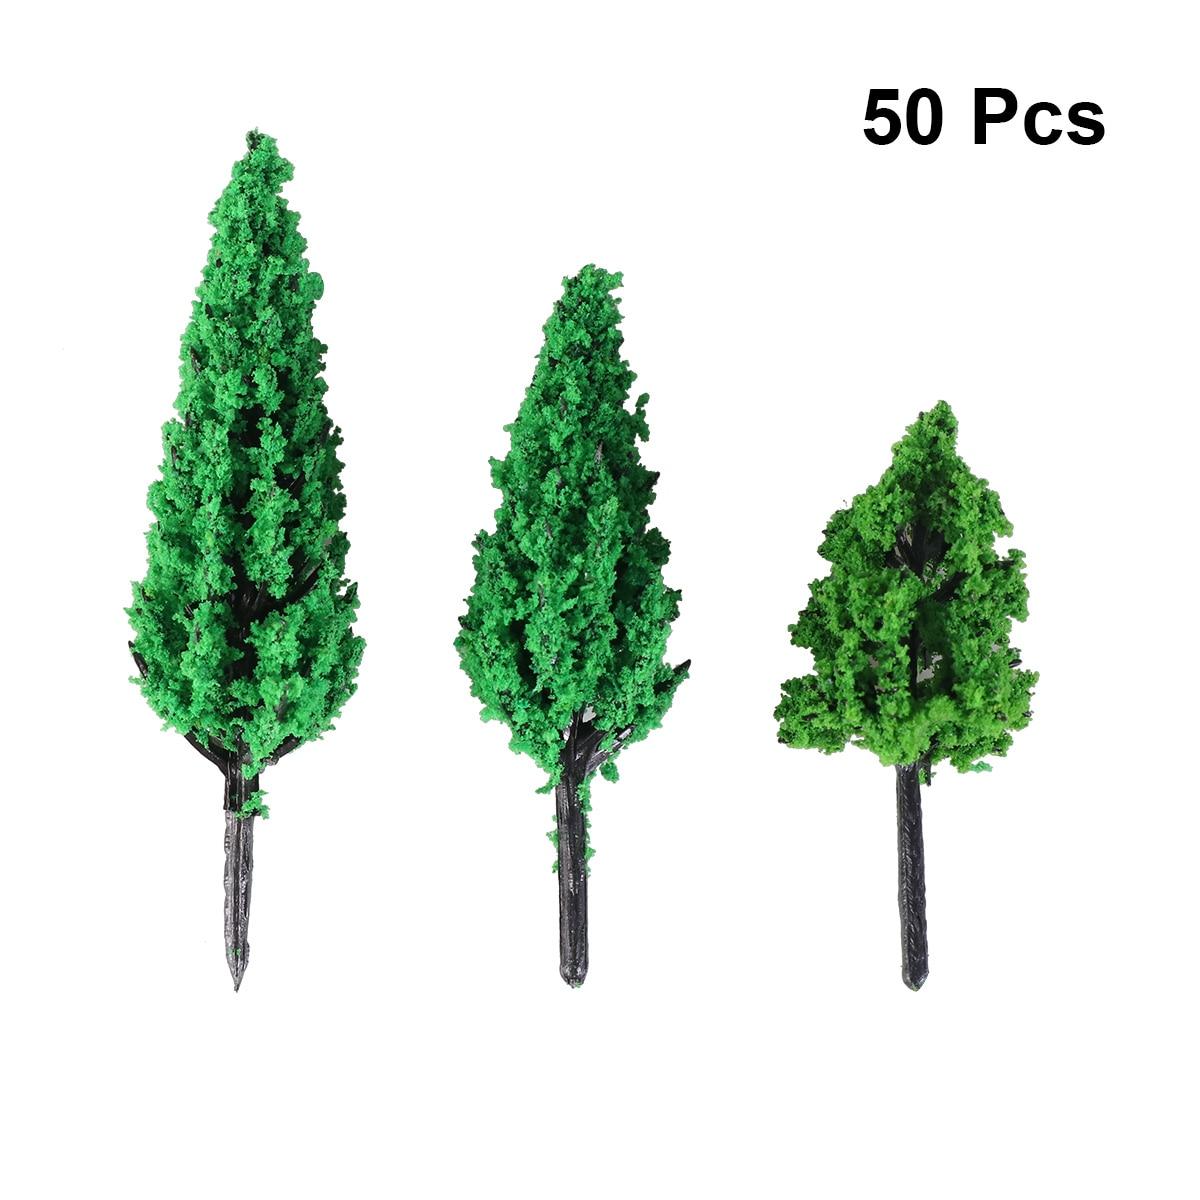 50pcs Model Trees Park Pine Poplar Forest Pagoda Miniature Diorama Micro Layout Scenery Decoration Mininatures Trees Model